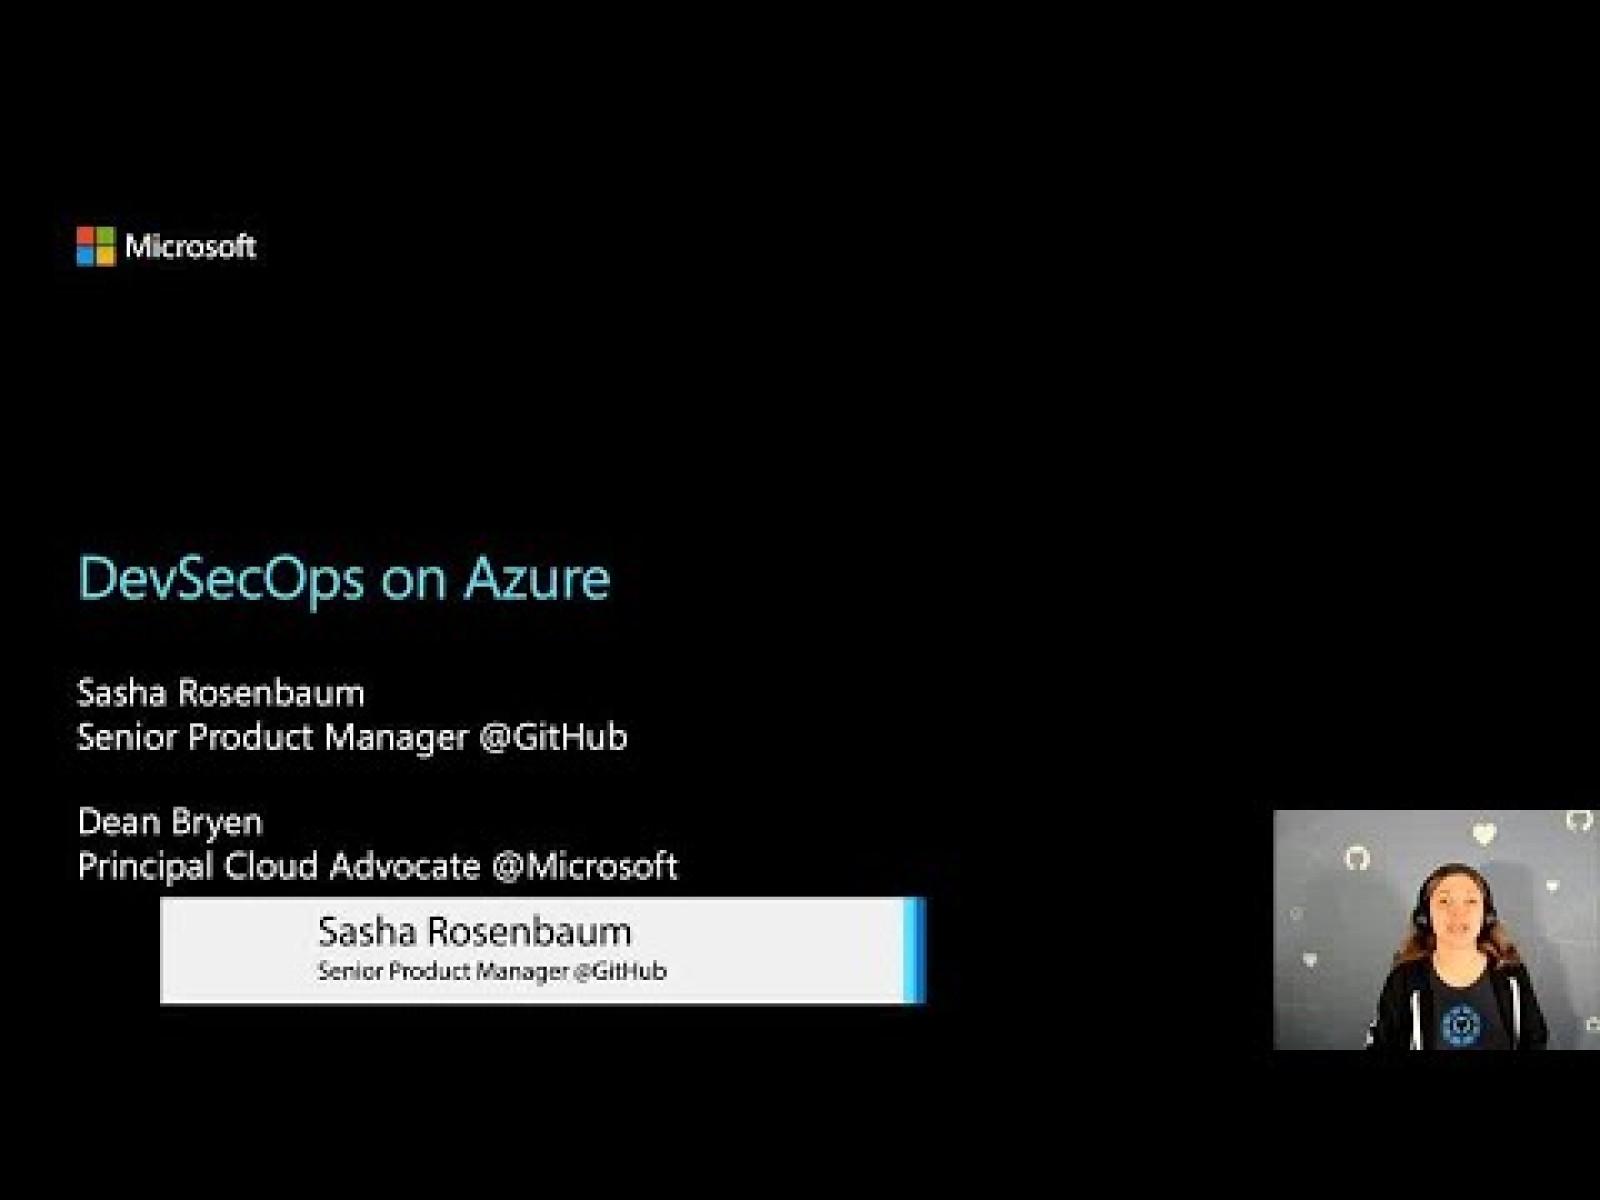 DevSecOps on Azure - MSBuild 2020